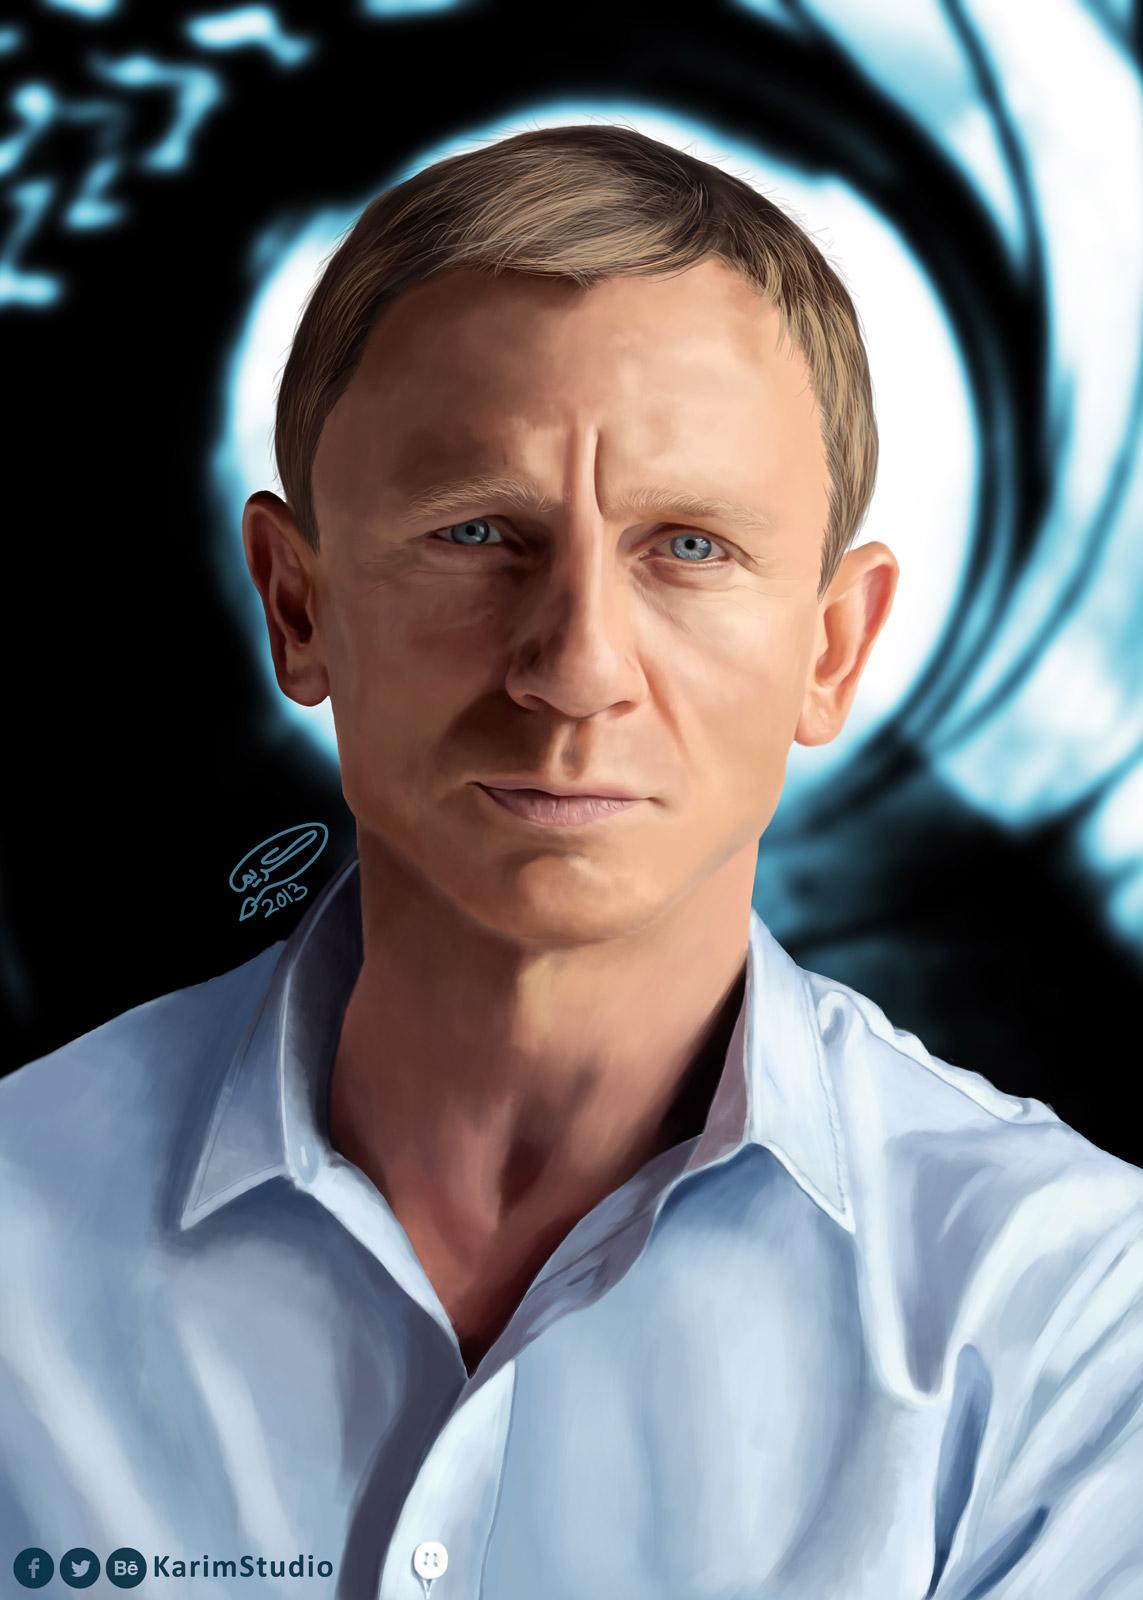 Daniel-Craig_low_quality